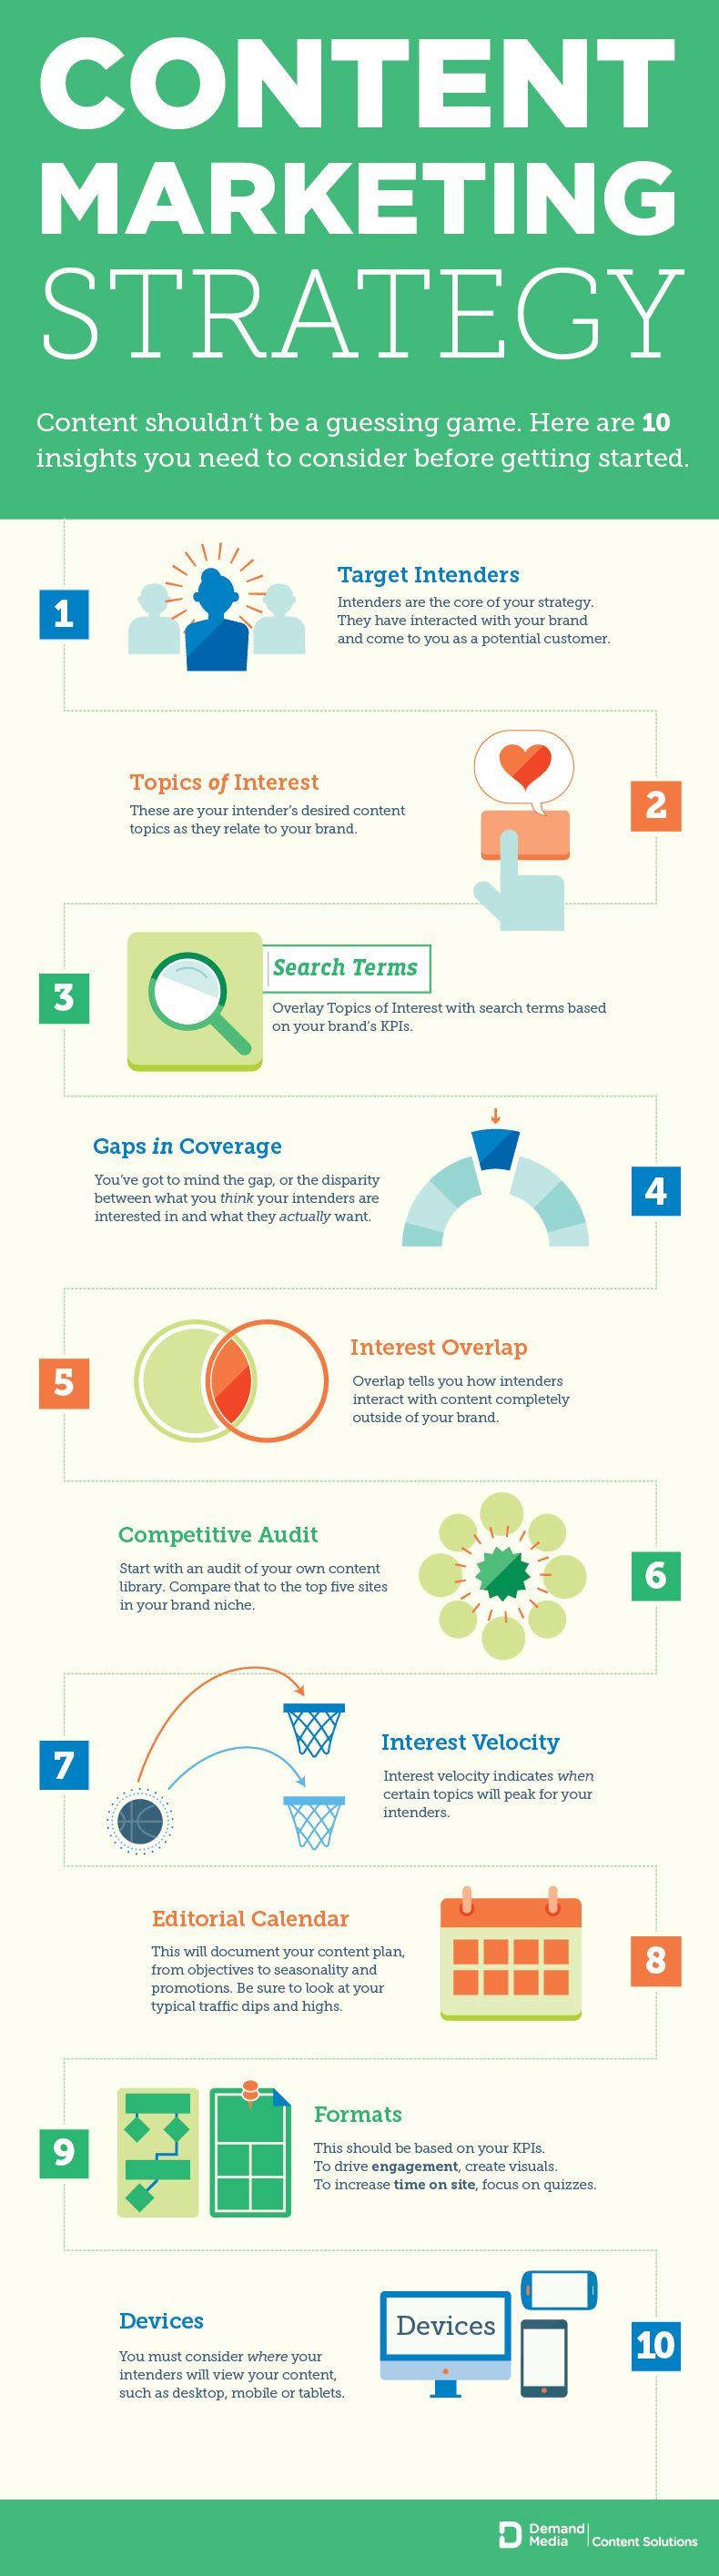 contentmarketingstrategy